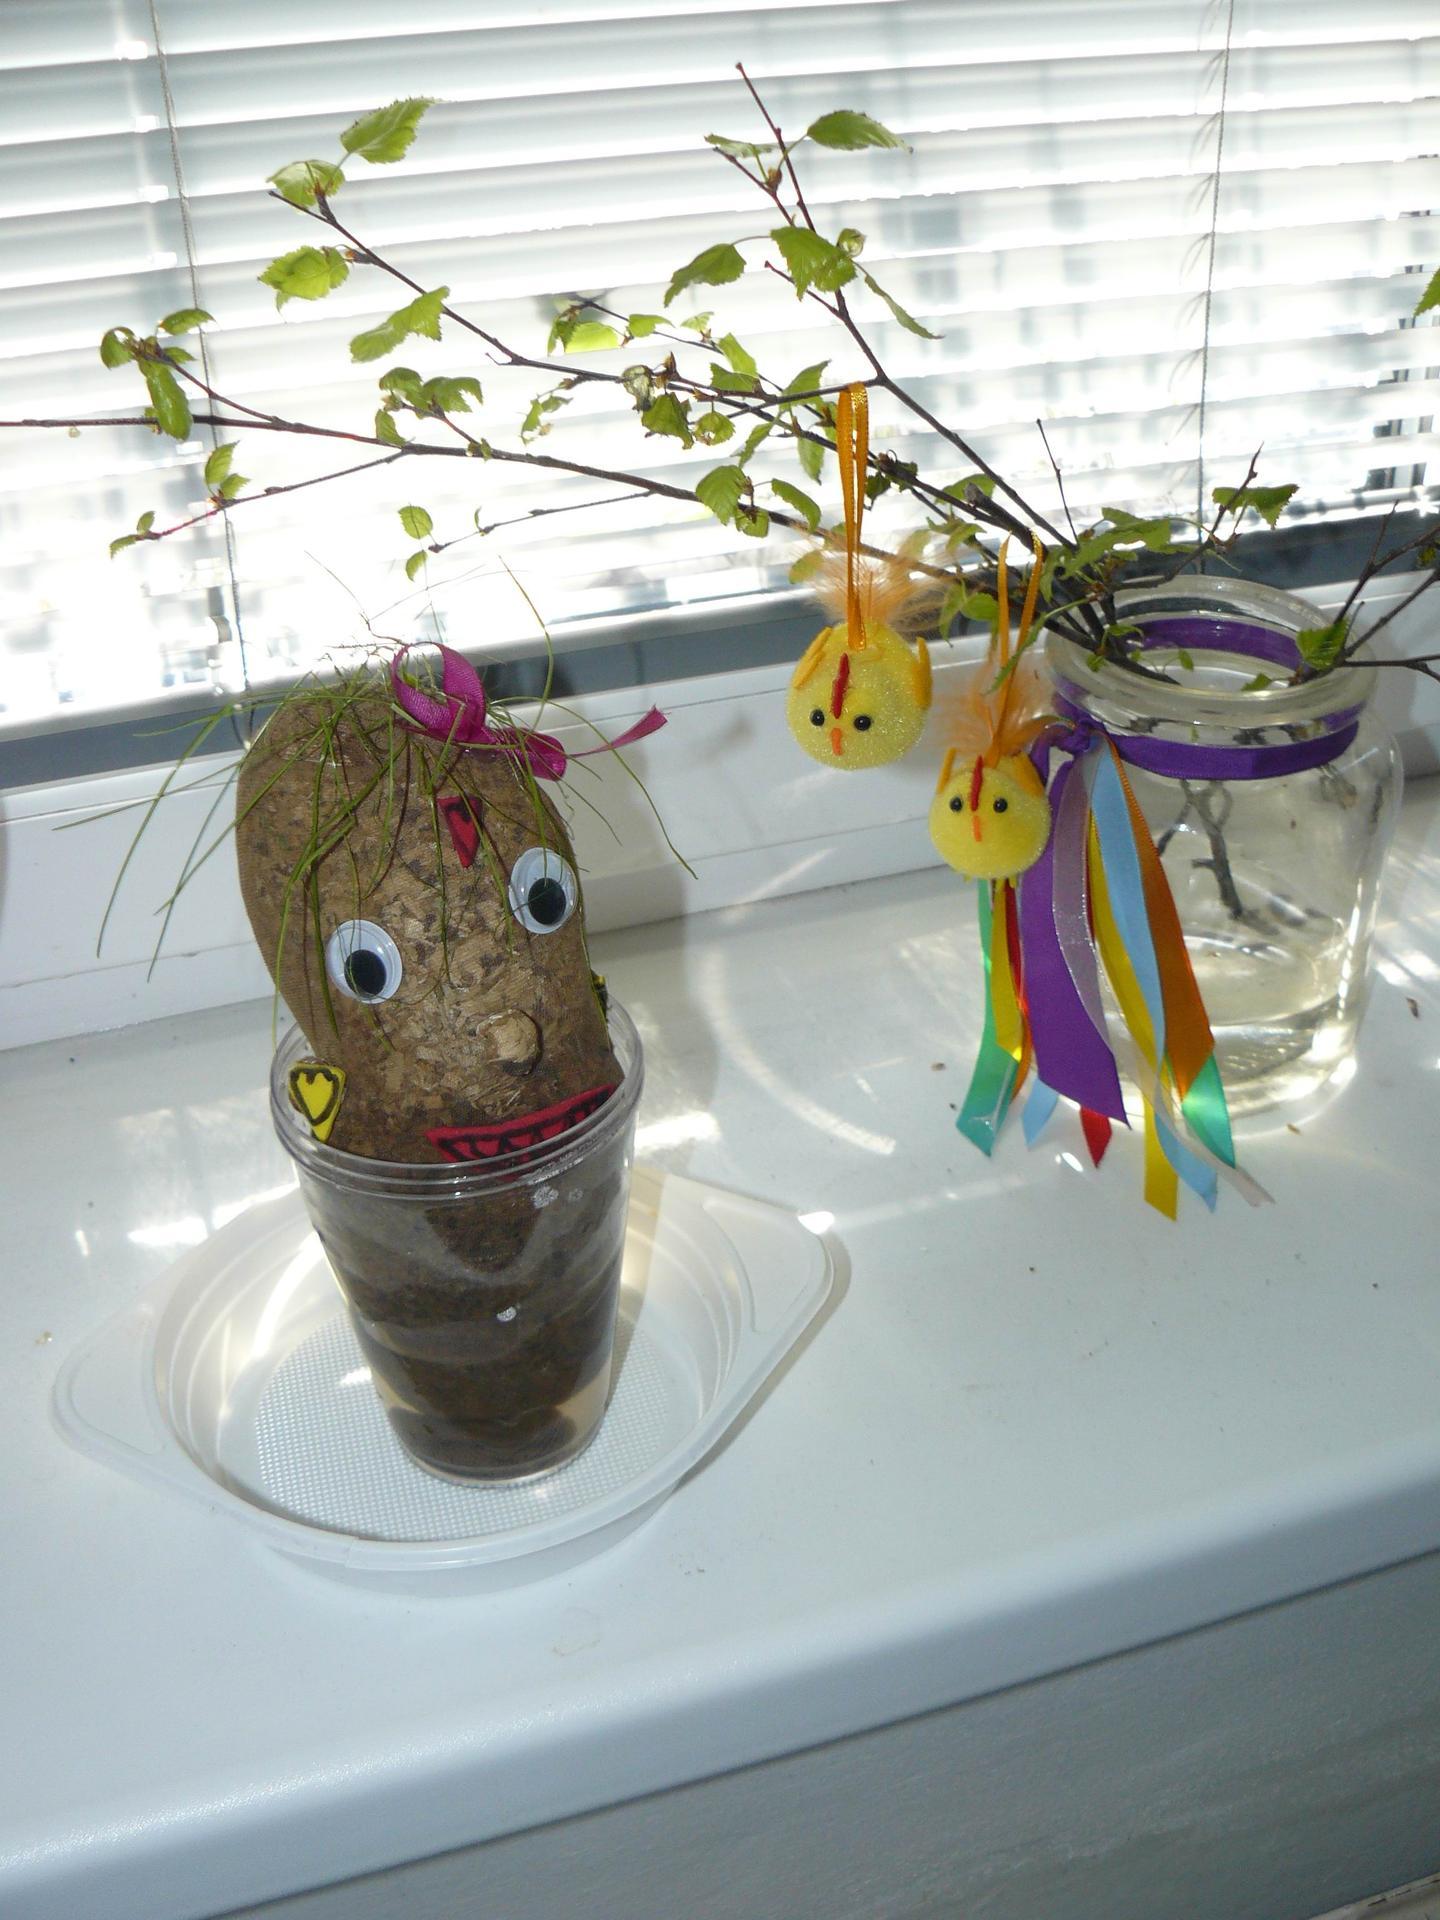 Domov 2020 - Miss potatoe z knihovny